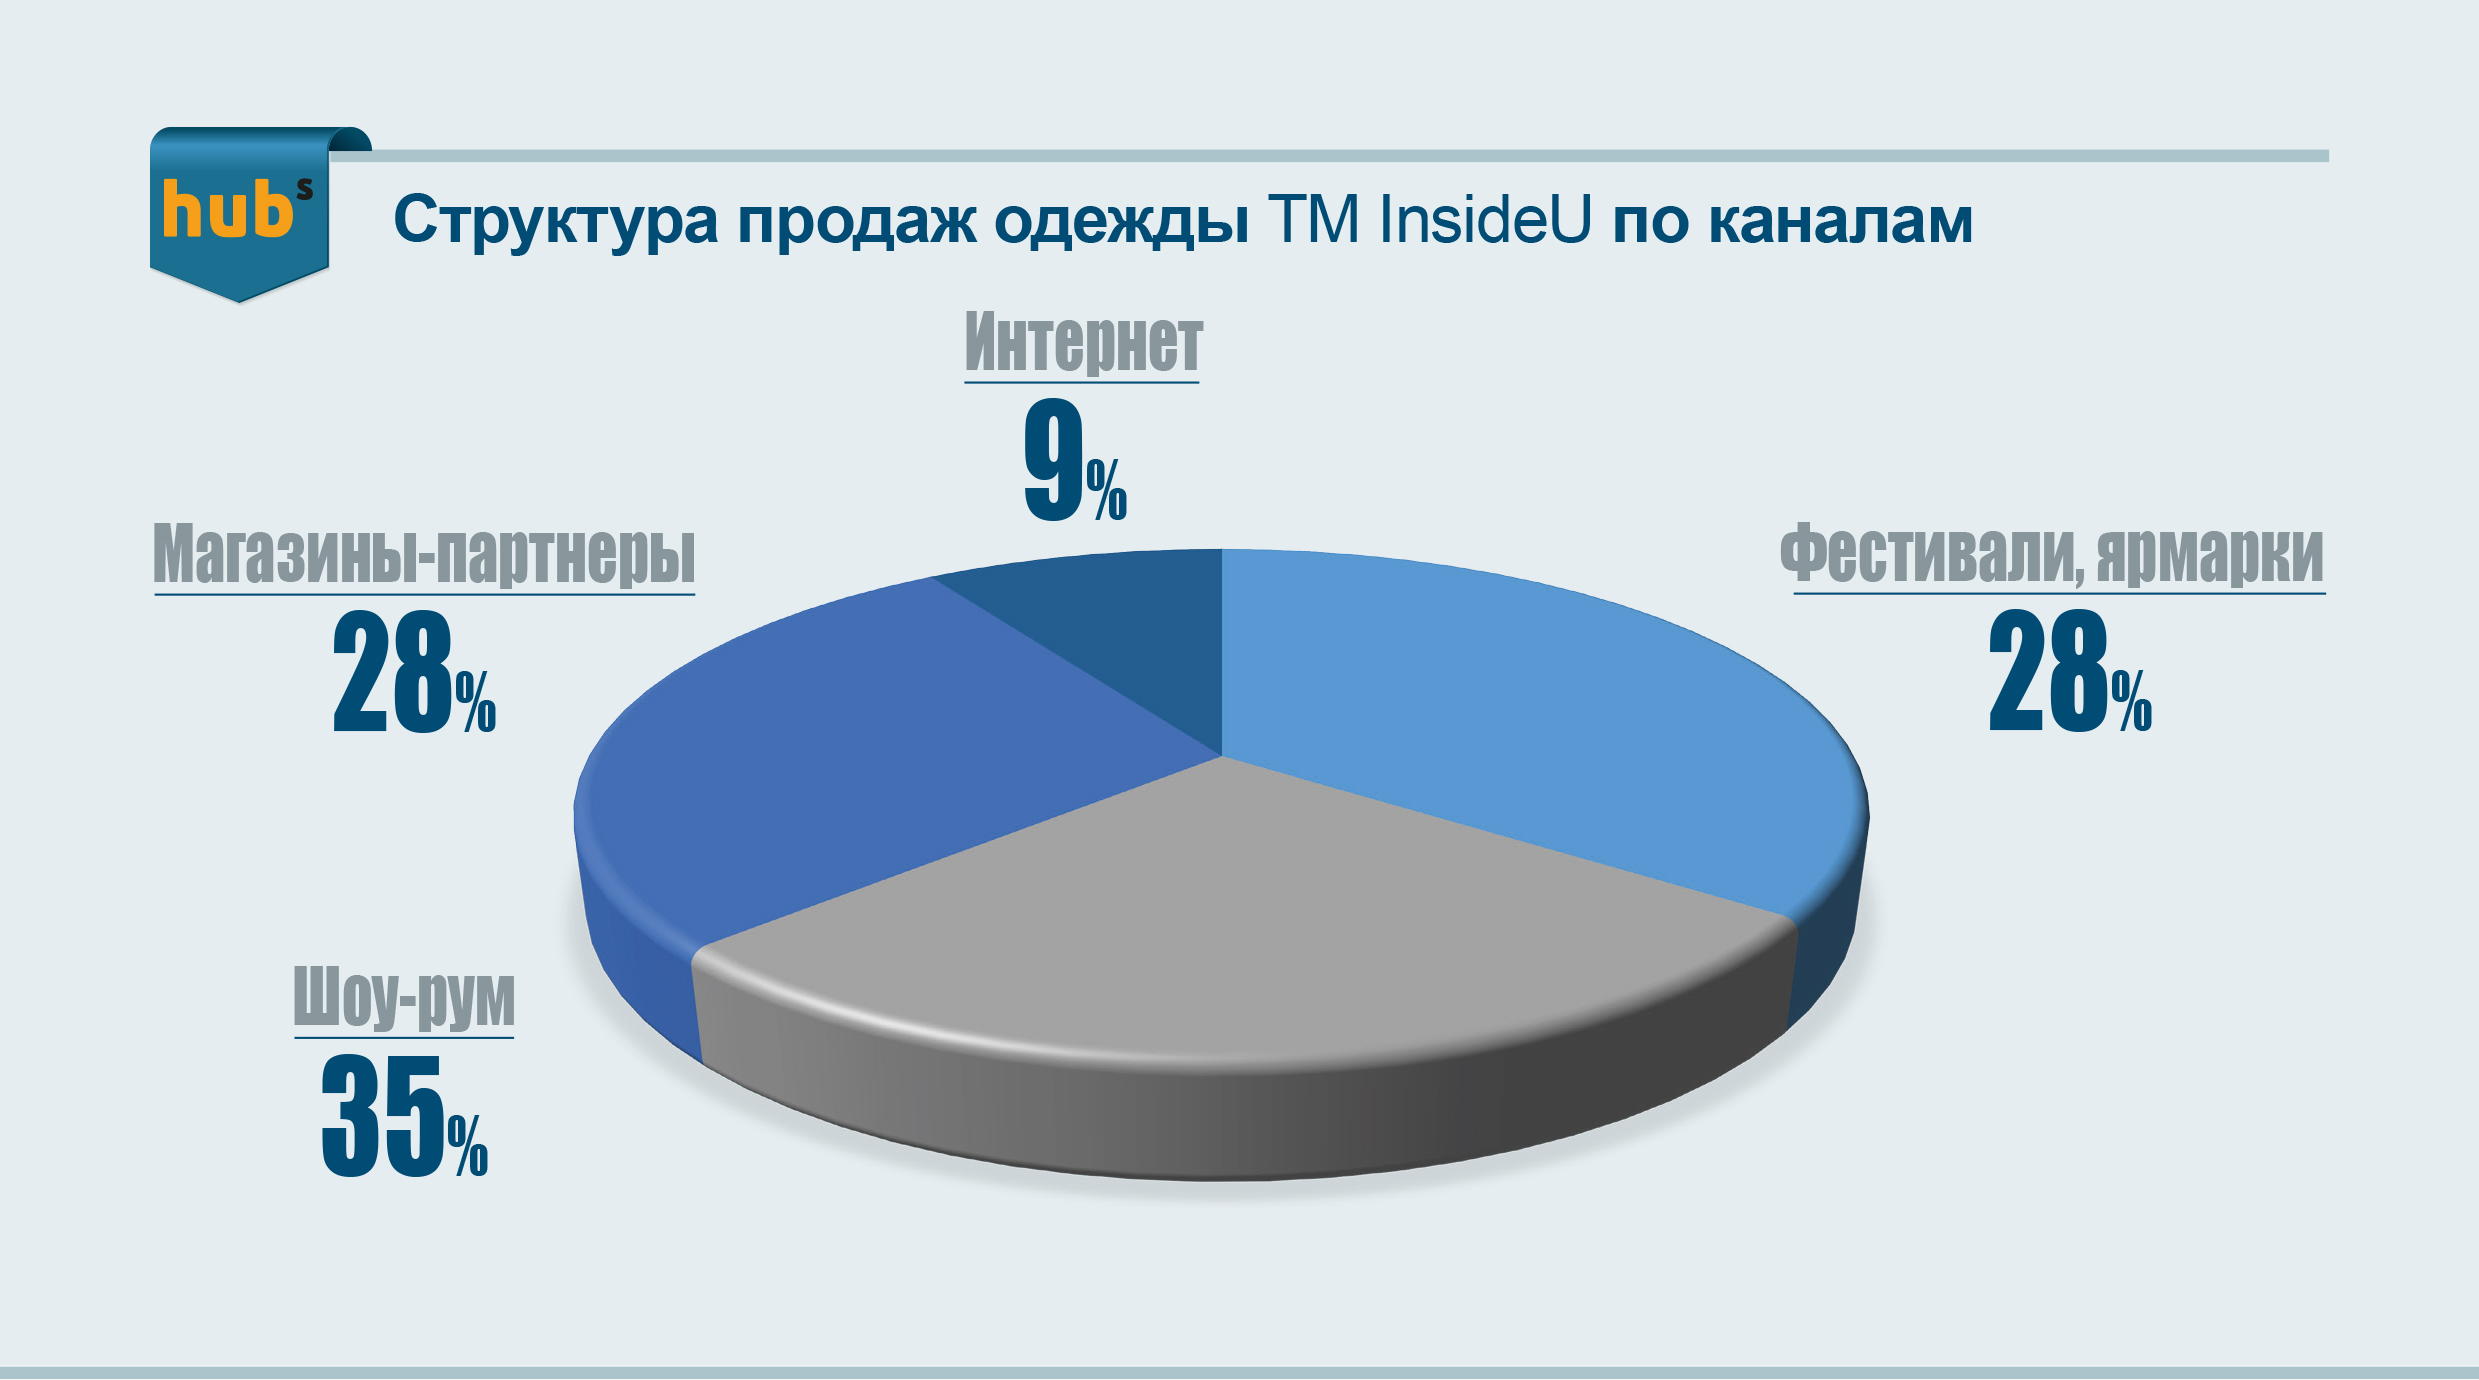 продажа одежды по каналам, МСБ, Unlimit Ukraine